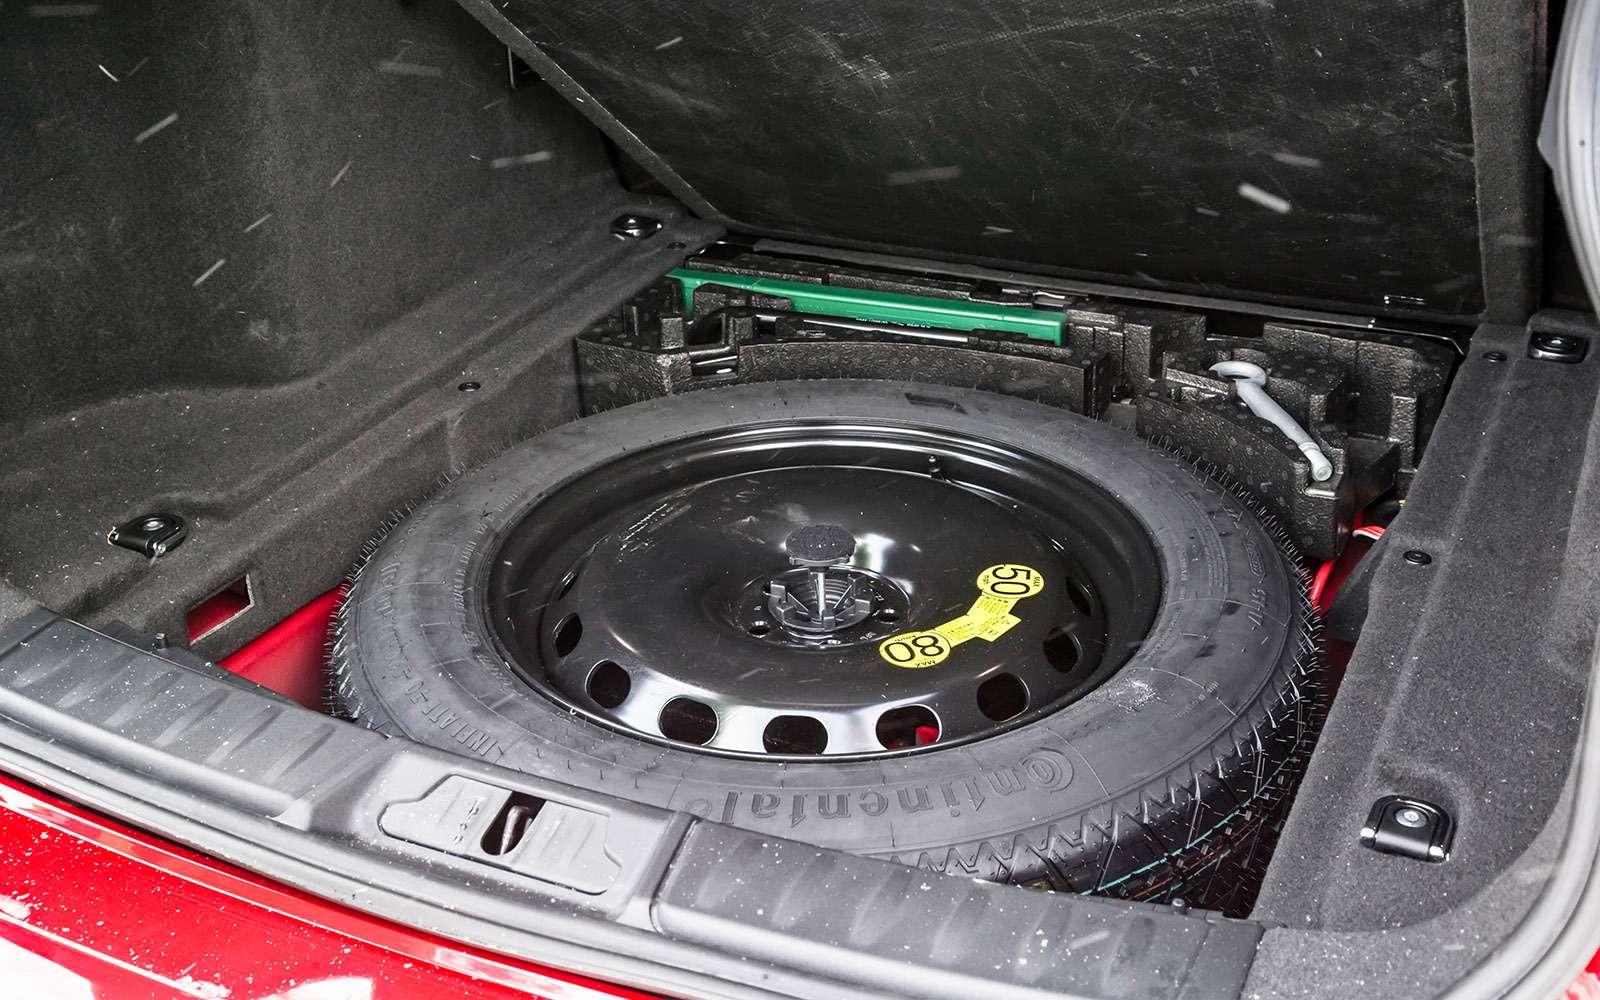 Тест премиум-кроссоверов: Lexus RX350, Cadillac XT5и Jaguar F-Pace— фото 721773